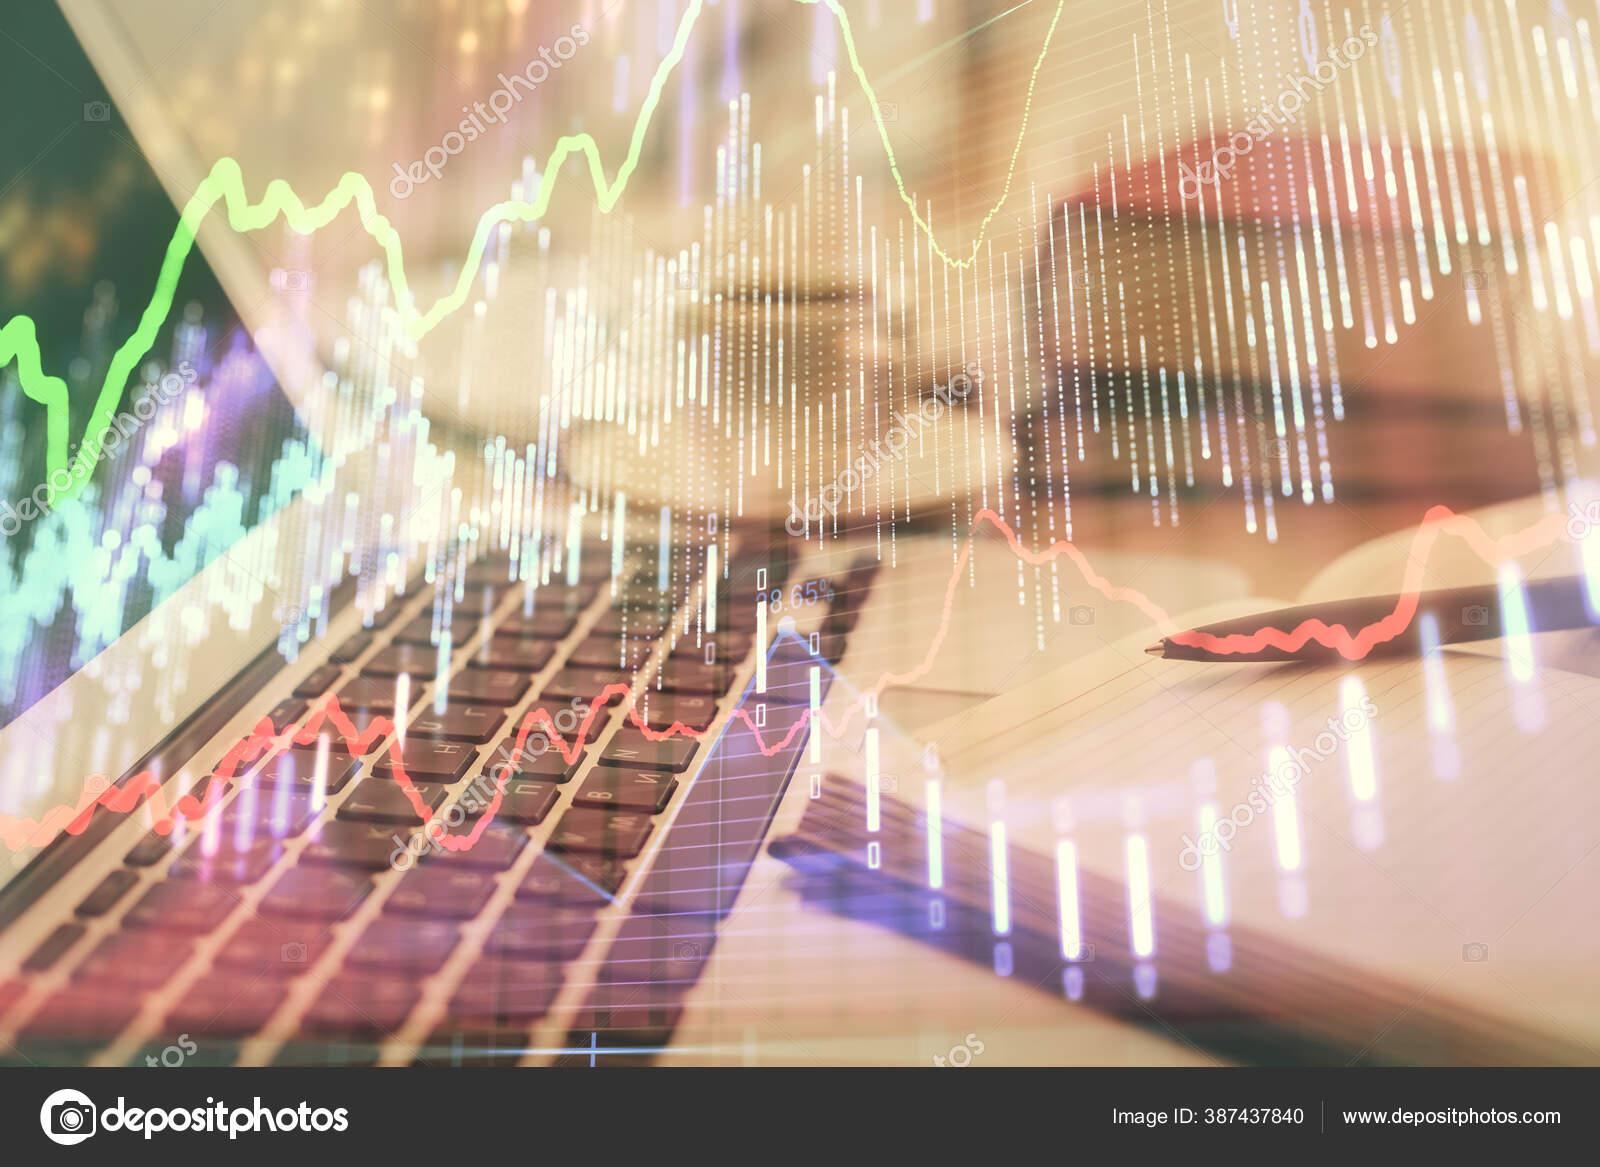 Defisit Perdagangan Barang AS Bertambah di Bulan Juli, Inventori Ritel Berkurang